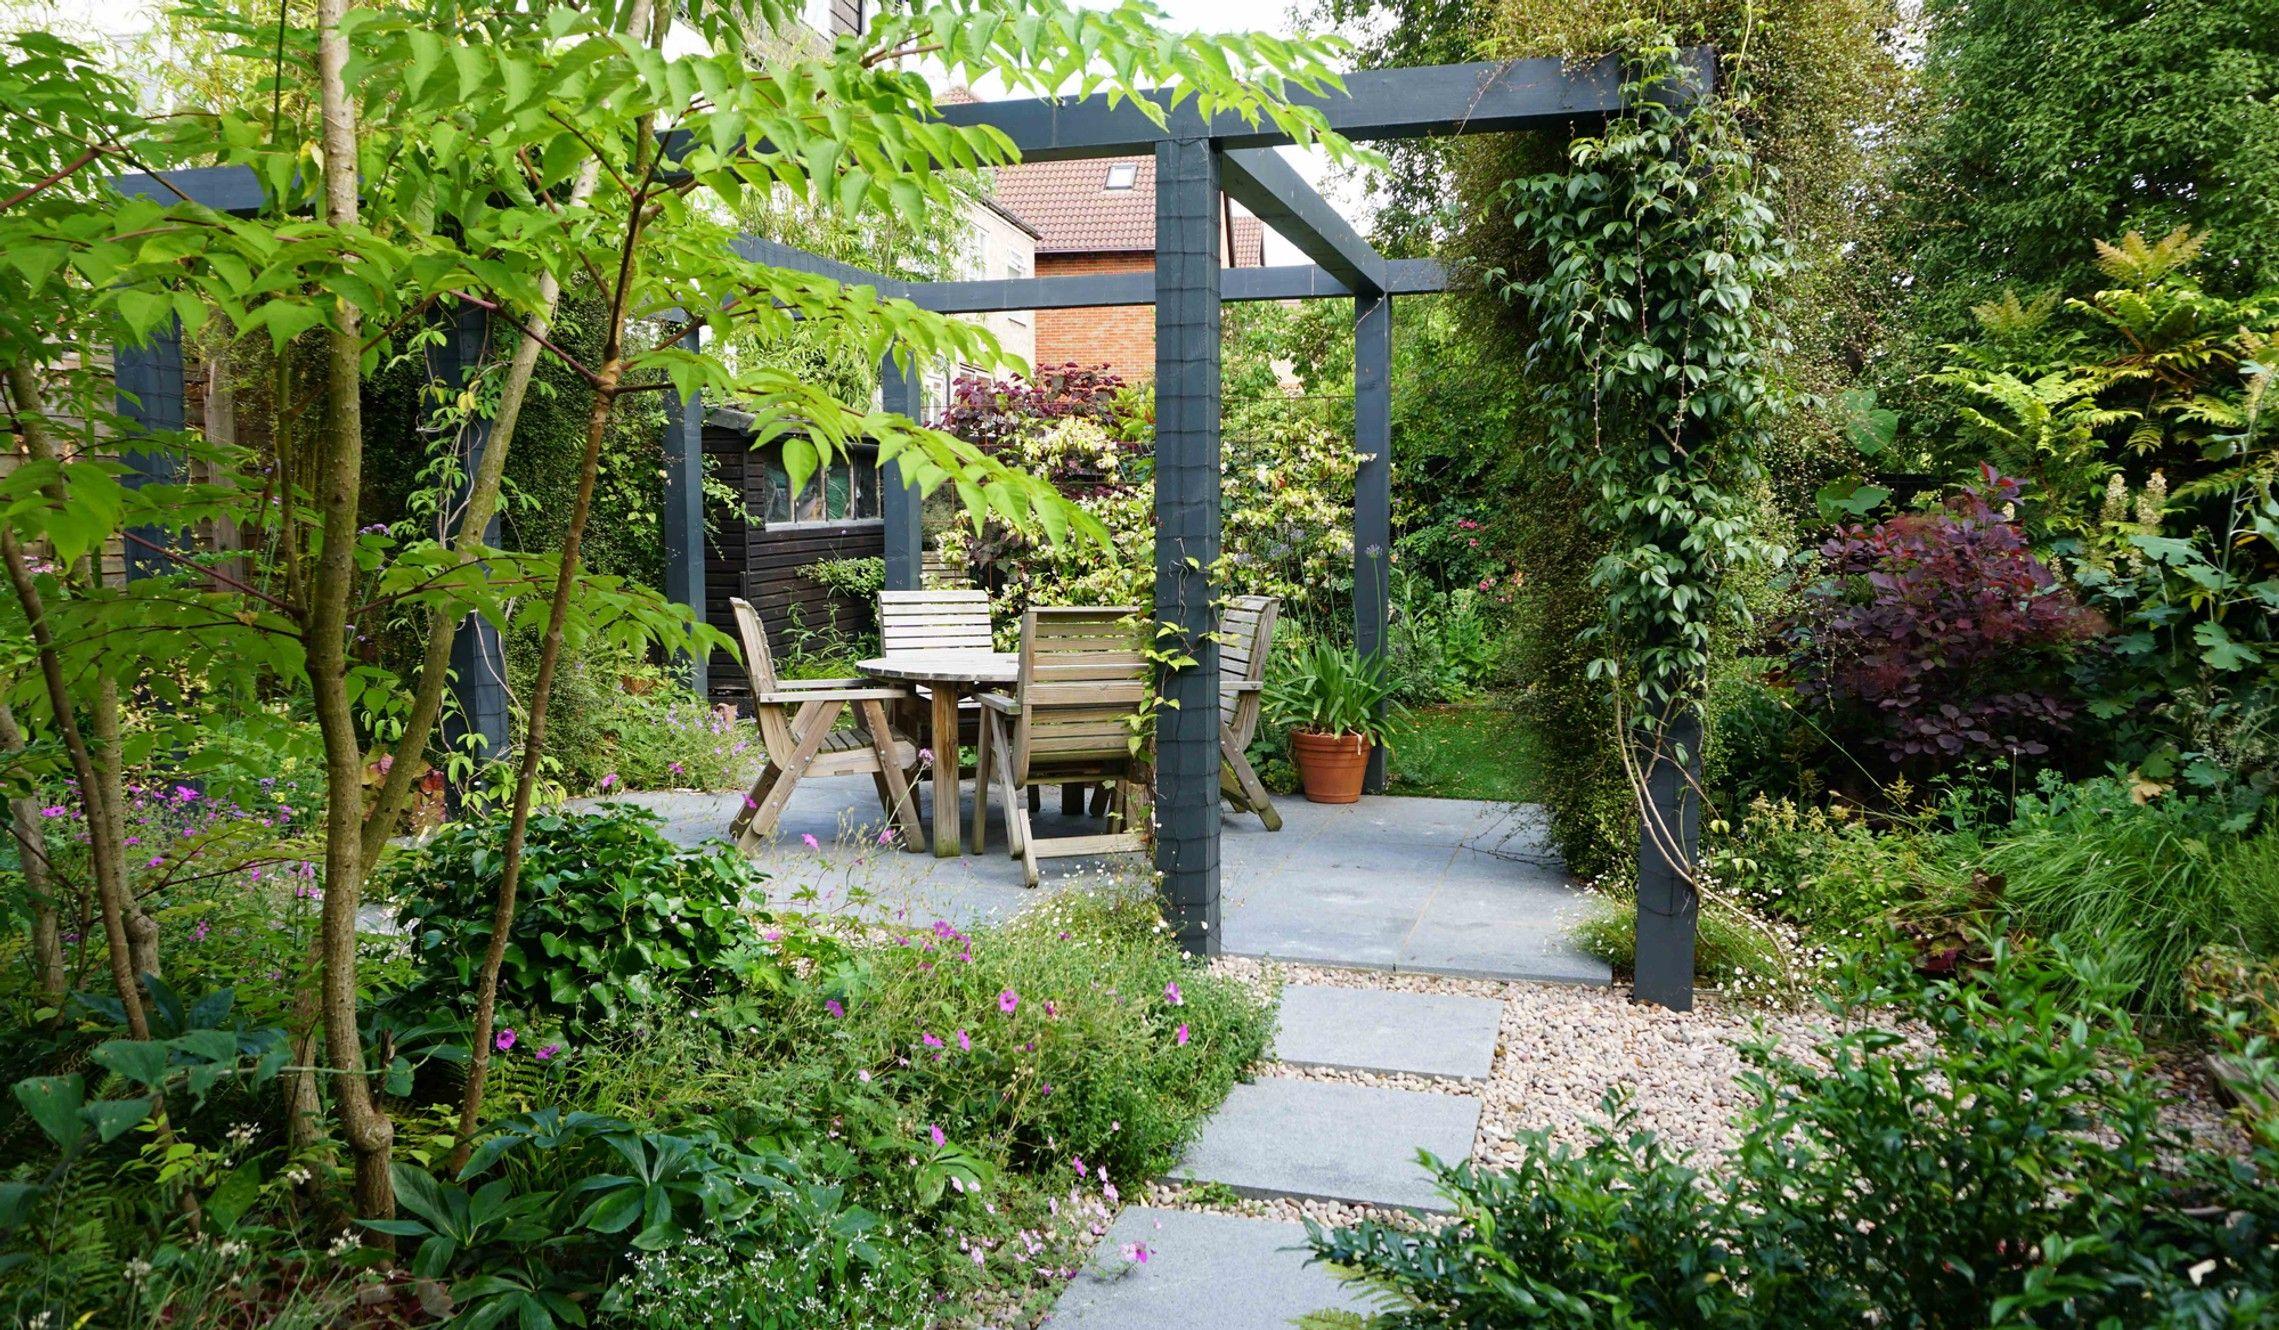 Planting Designs And Ideas For Seaside Low Maintenance Gravel Gardens Pergola Garden London Garden Garden Design